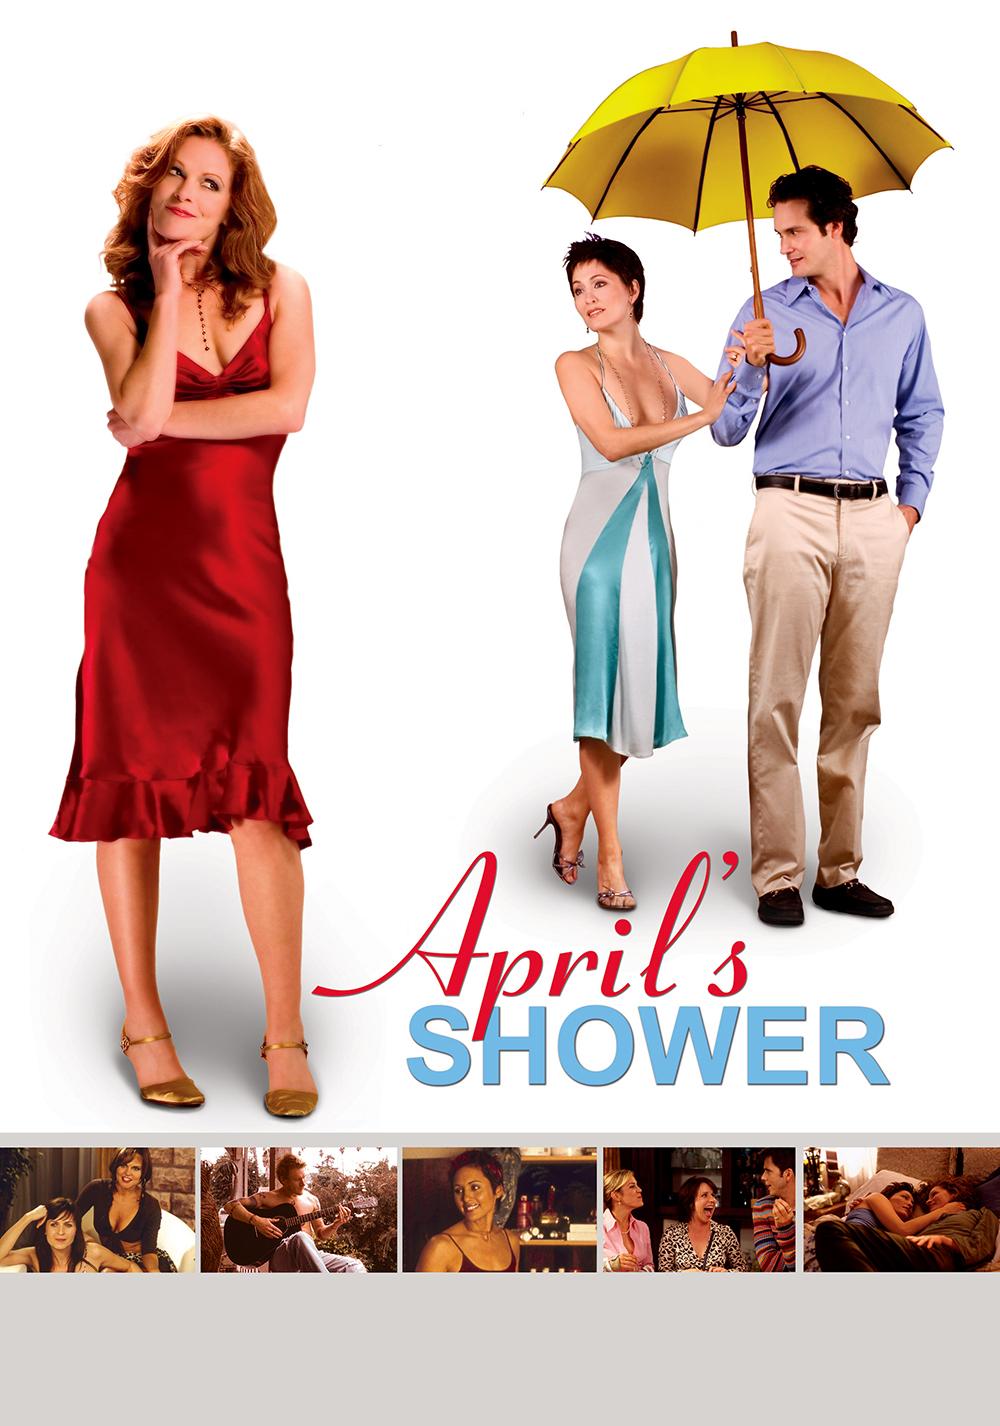 April's Shower | Movie fanart | fanart.tv